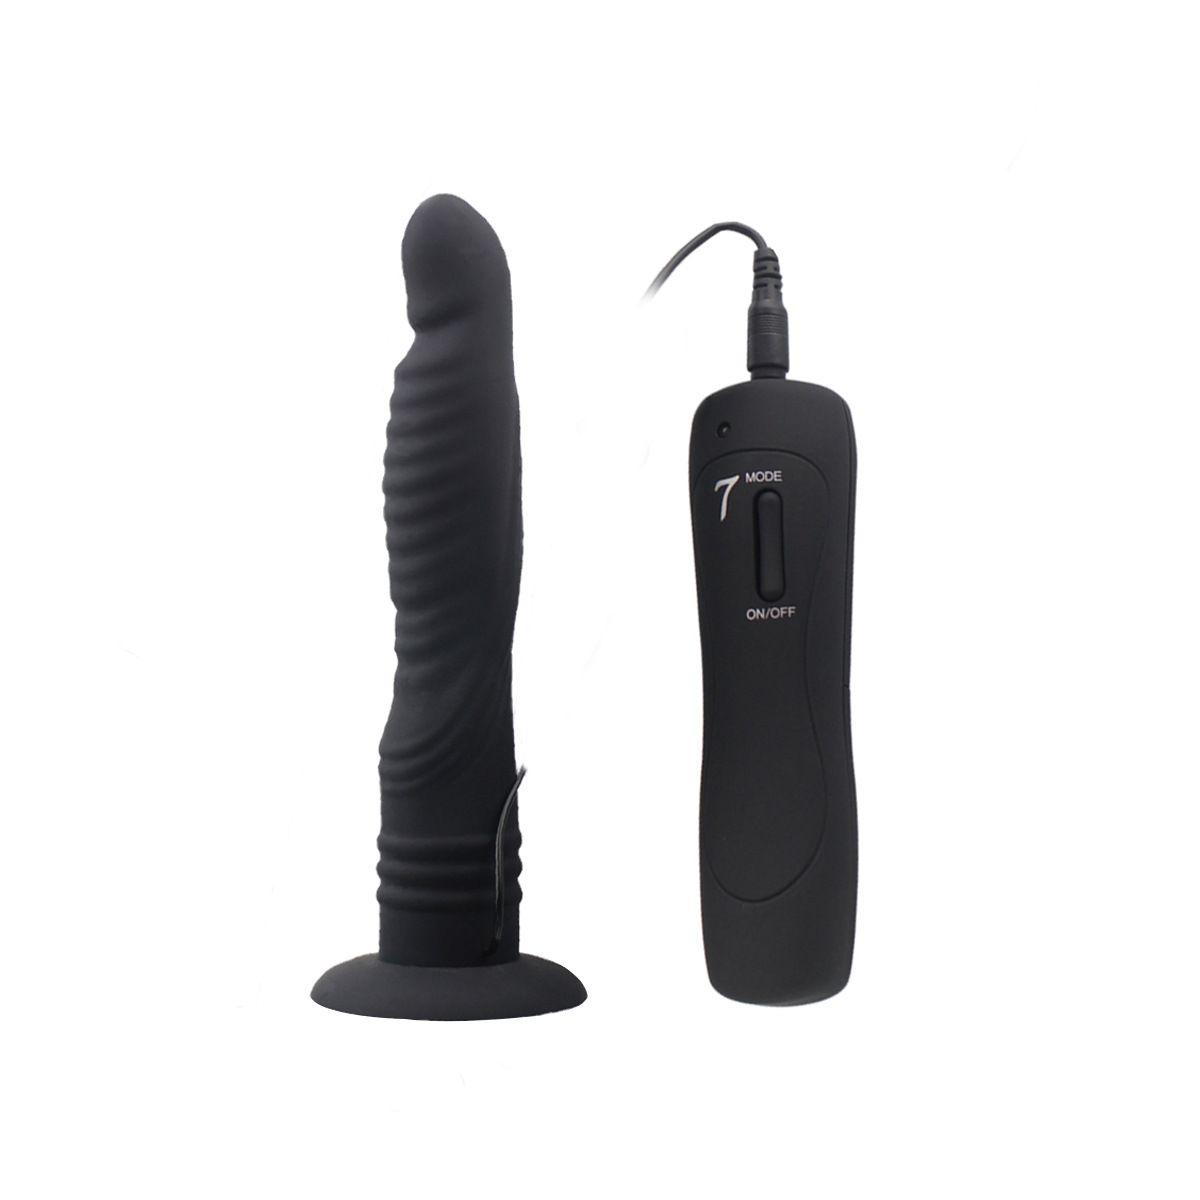 7 mode G-spot dildo vibrator vibe with sucker masturbation cunt insertion vagina massage adult sex toys for women pink black AFL-hc84017